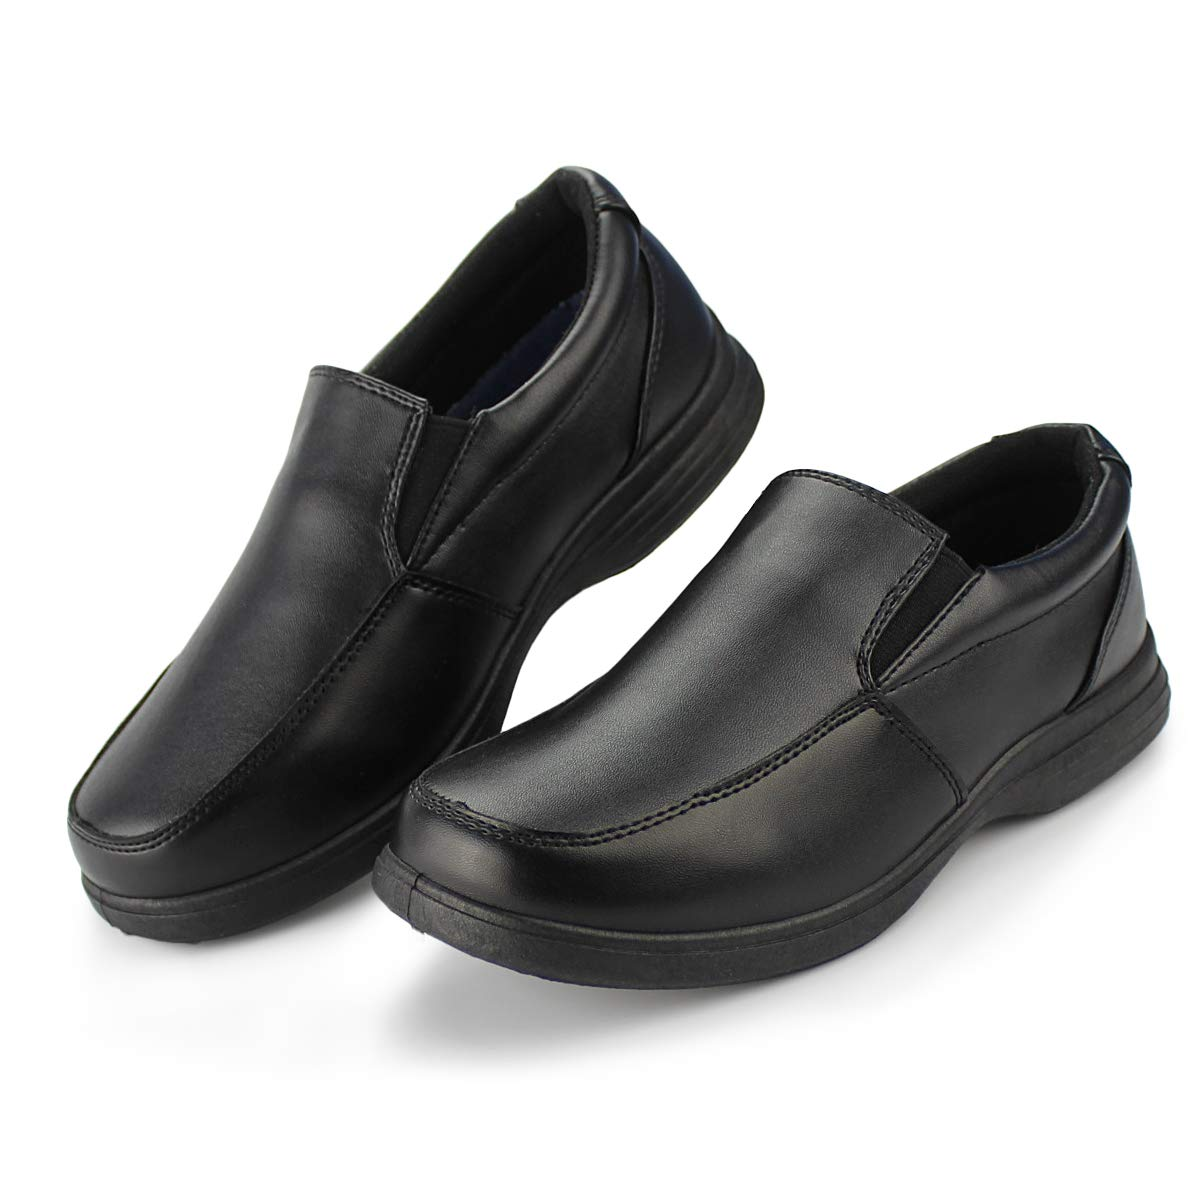 Hawkwell Boy's School Uniform Dress Shoe(Little Kid), Black PU, 13 M US